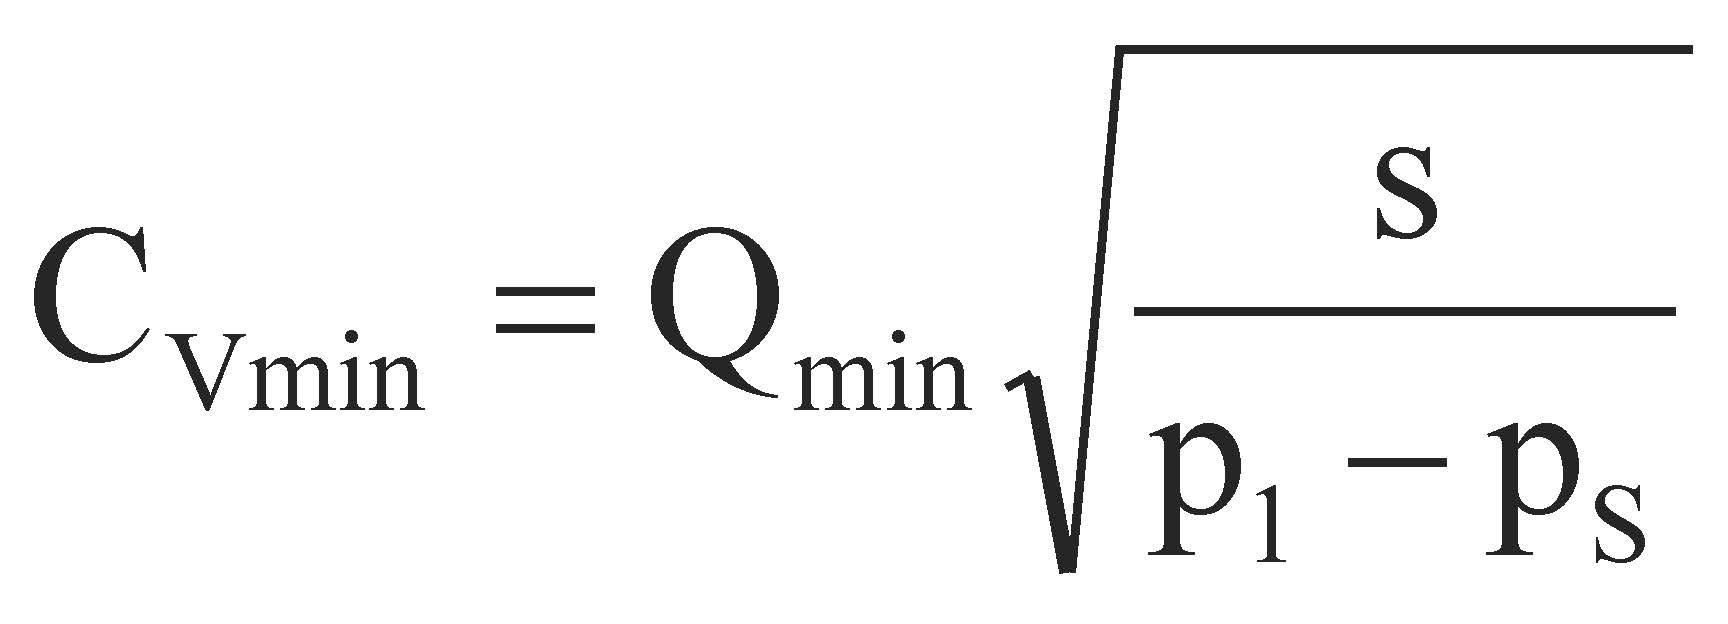 ocv_modelo_127-series_mining_sizing1